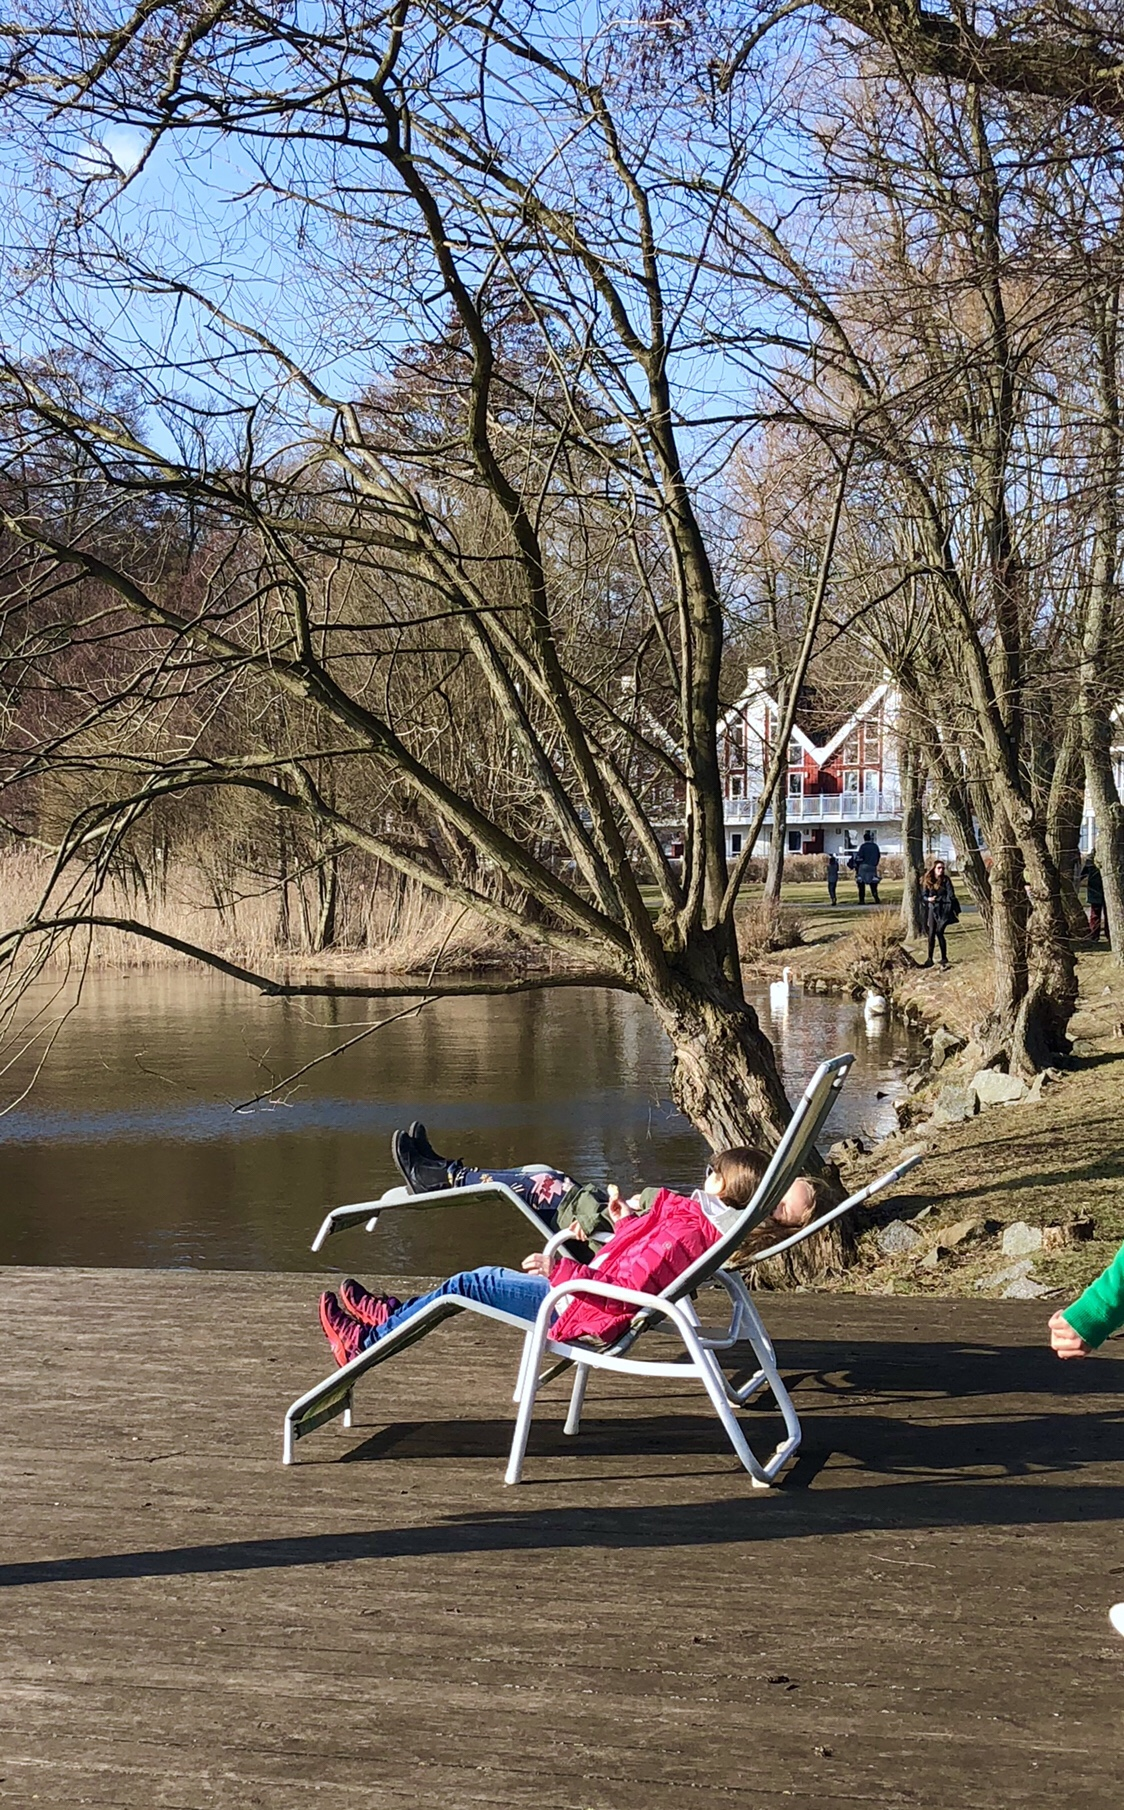 Bad Saarow zu Ostern | berlinmittemom.com